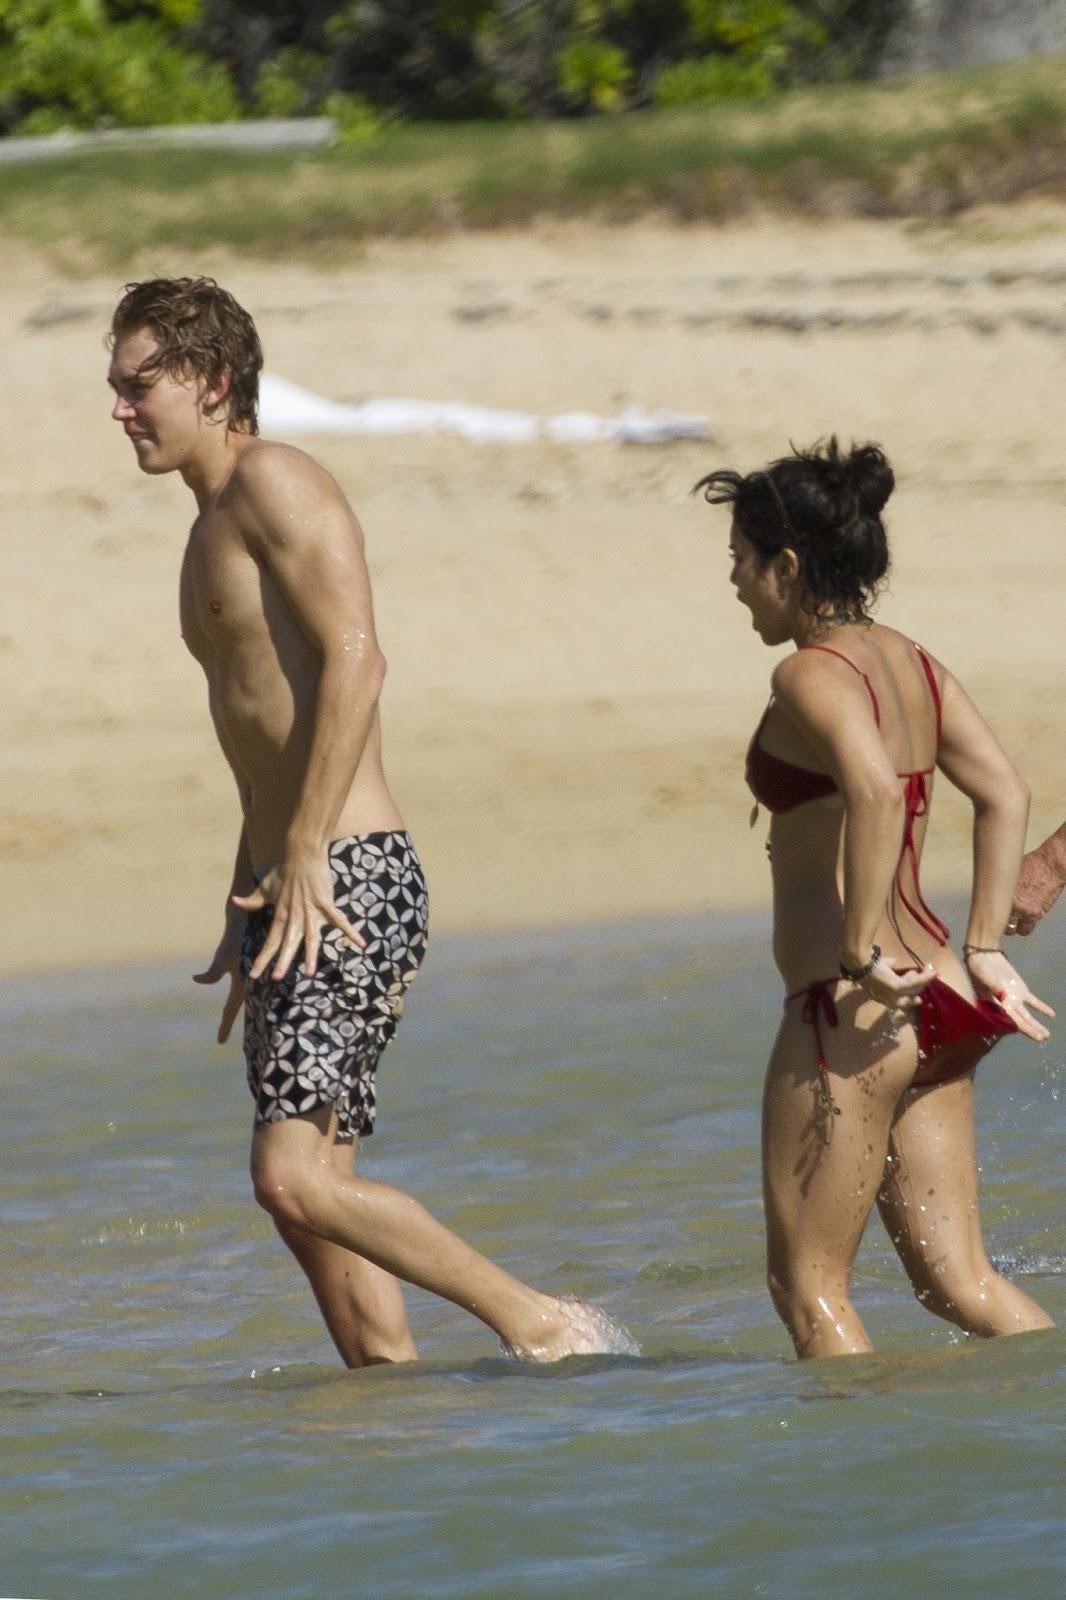 vanessa hudgens topless at the beach